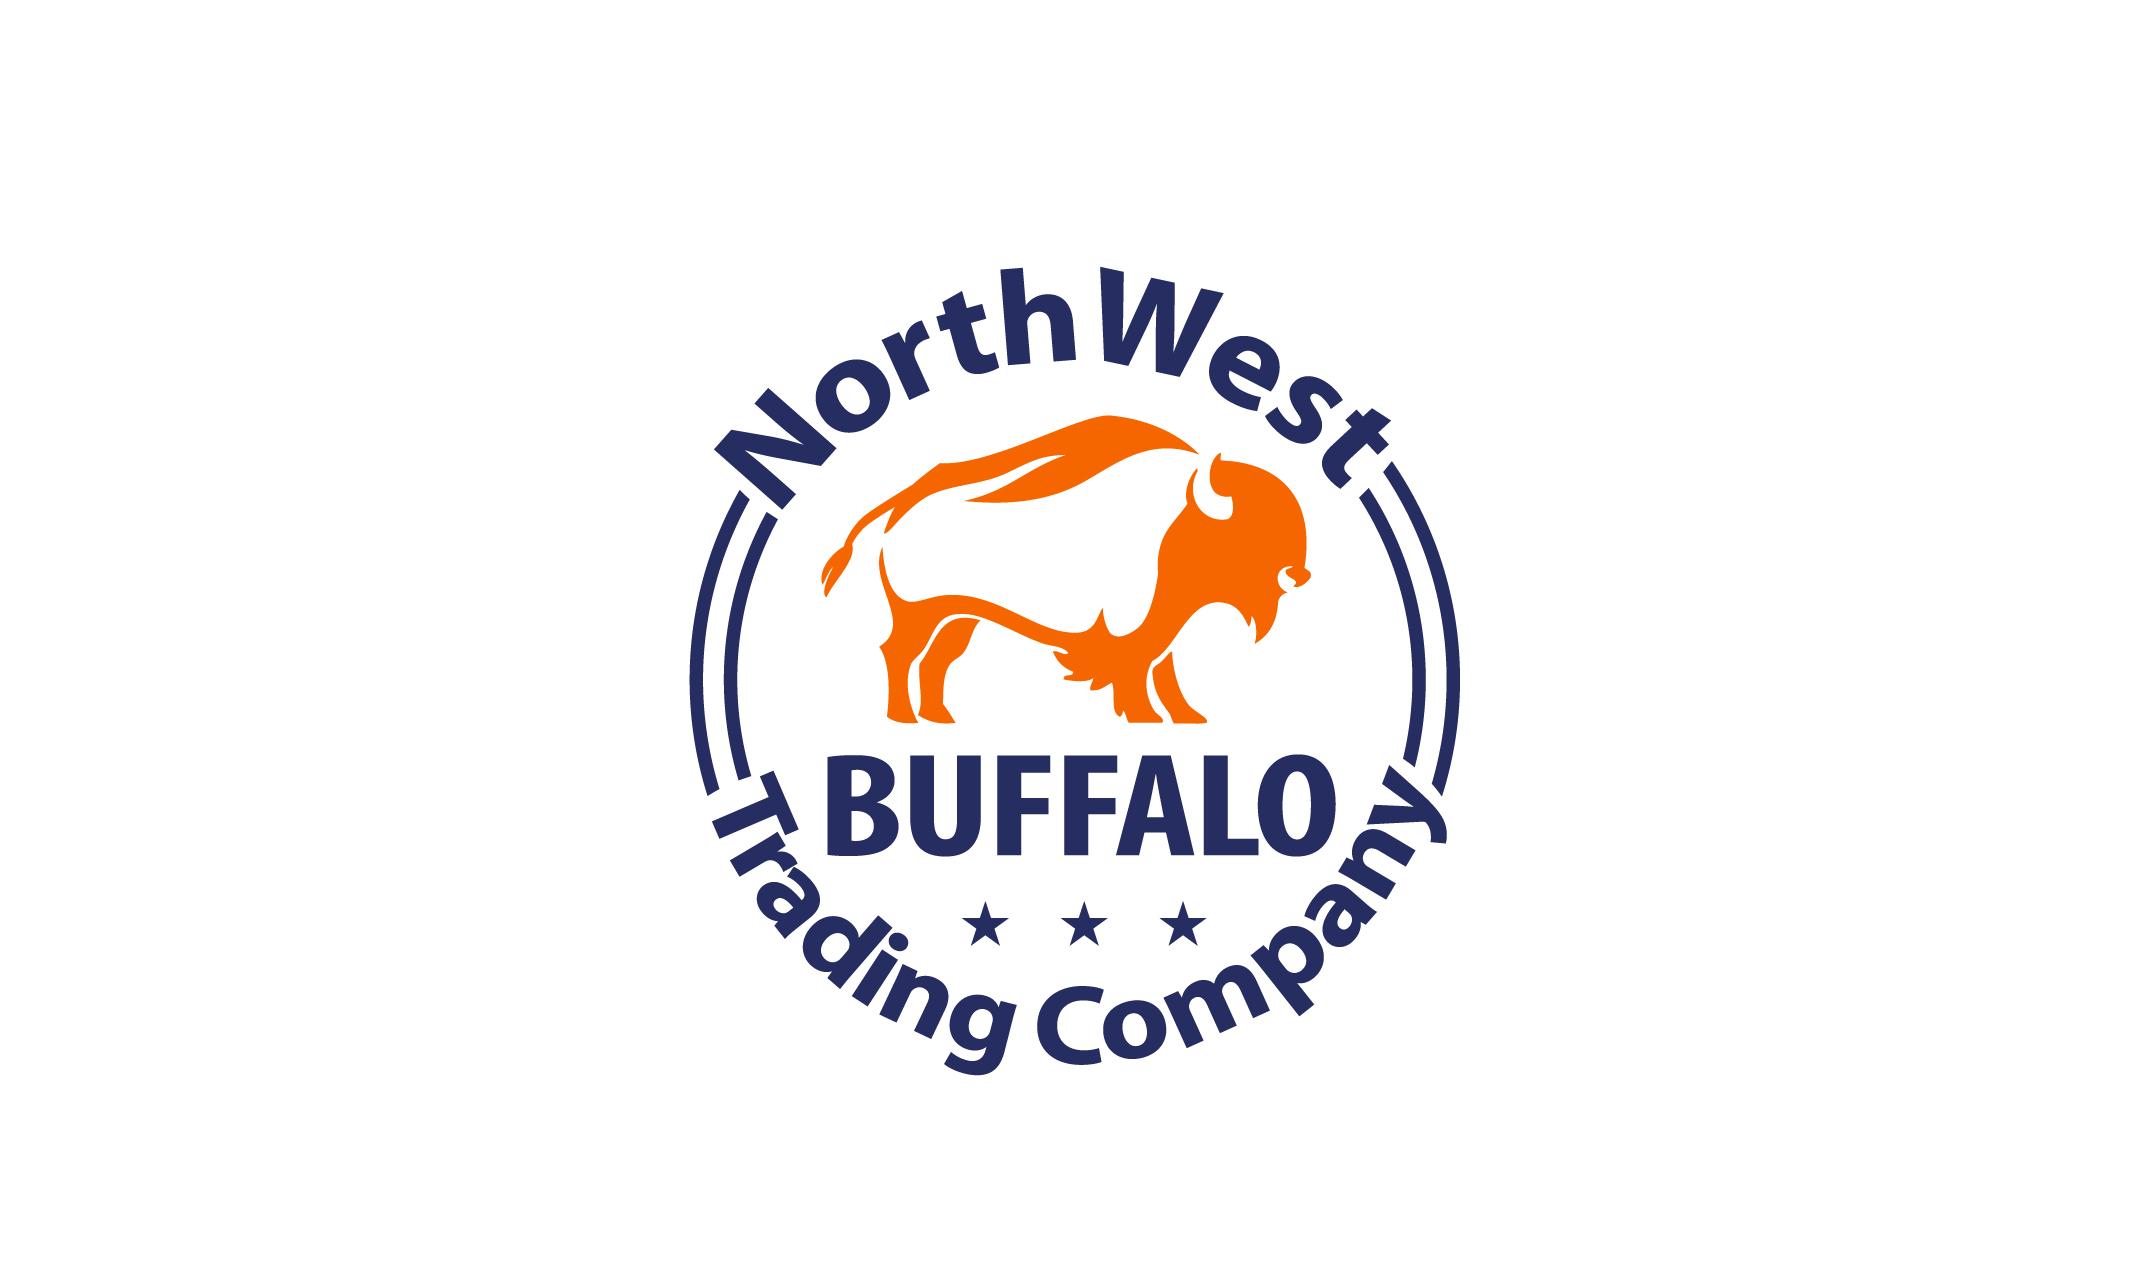 NorthWest Buffalo Trading Company Ltd.